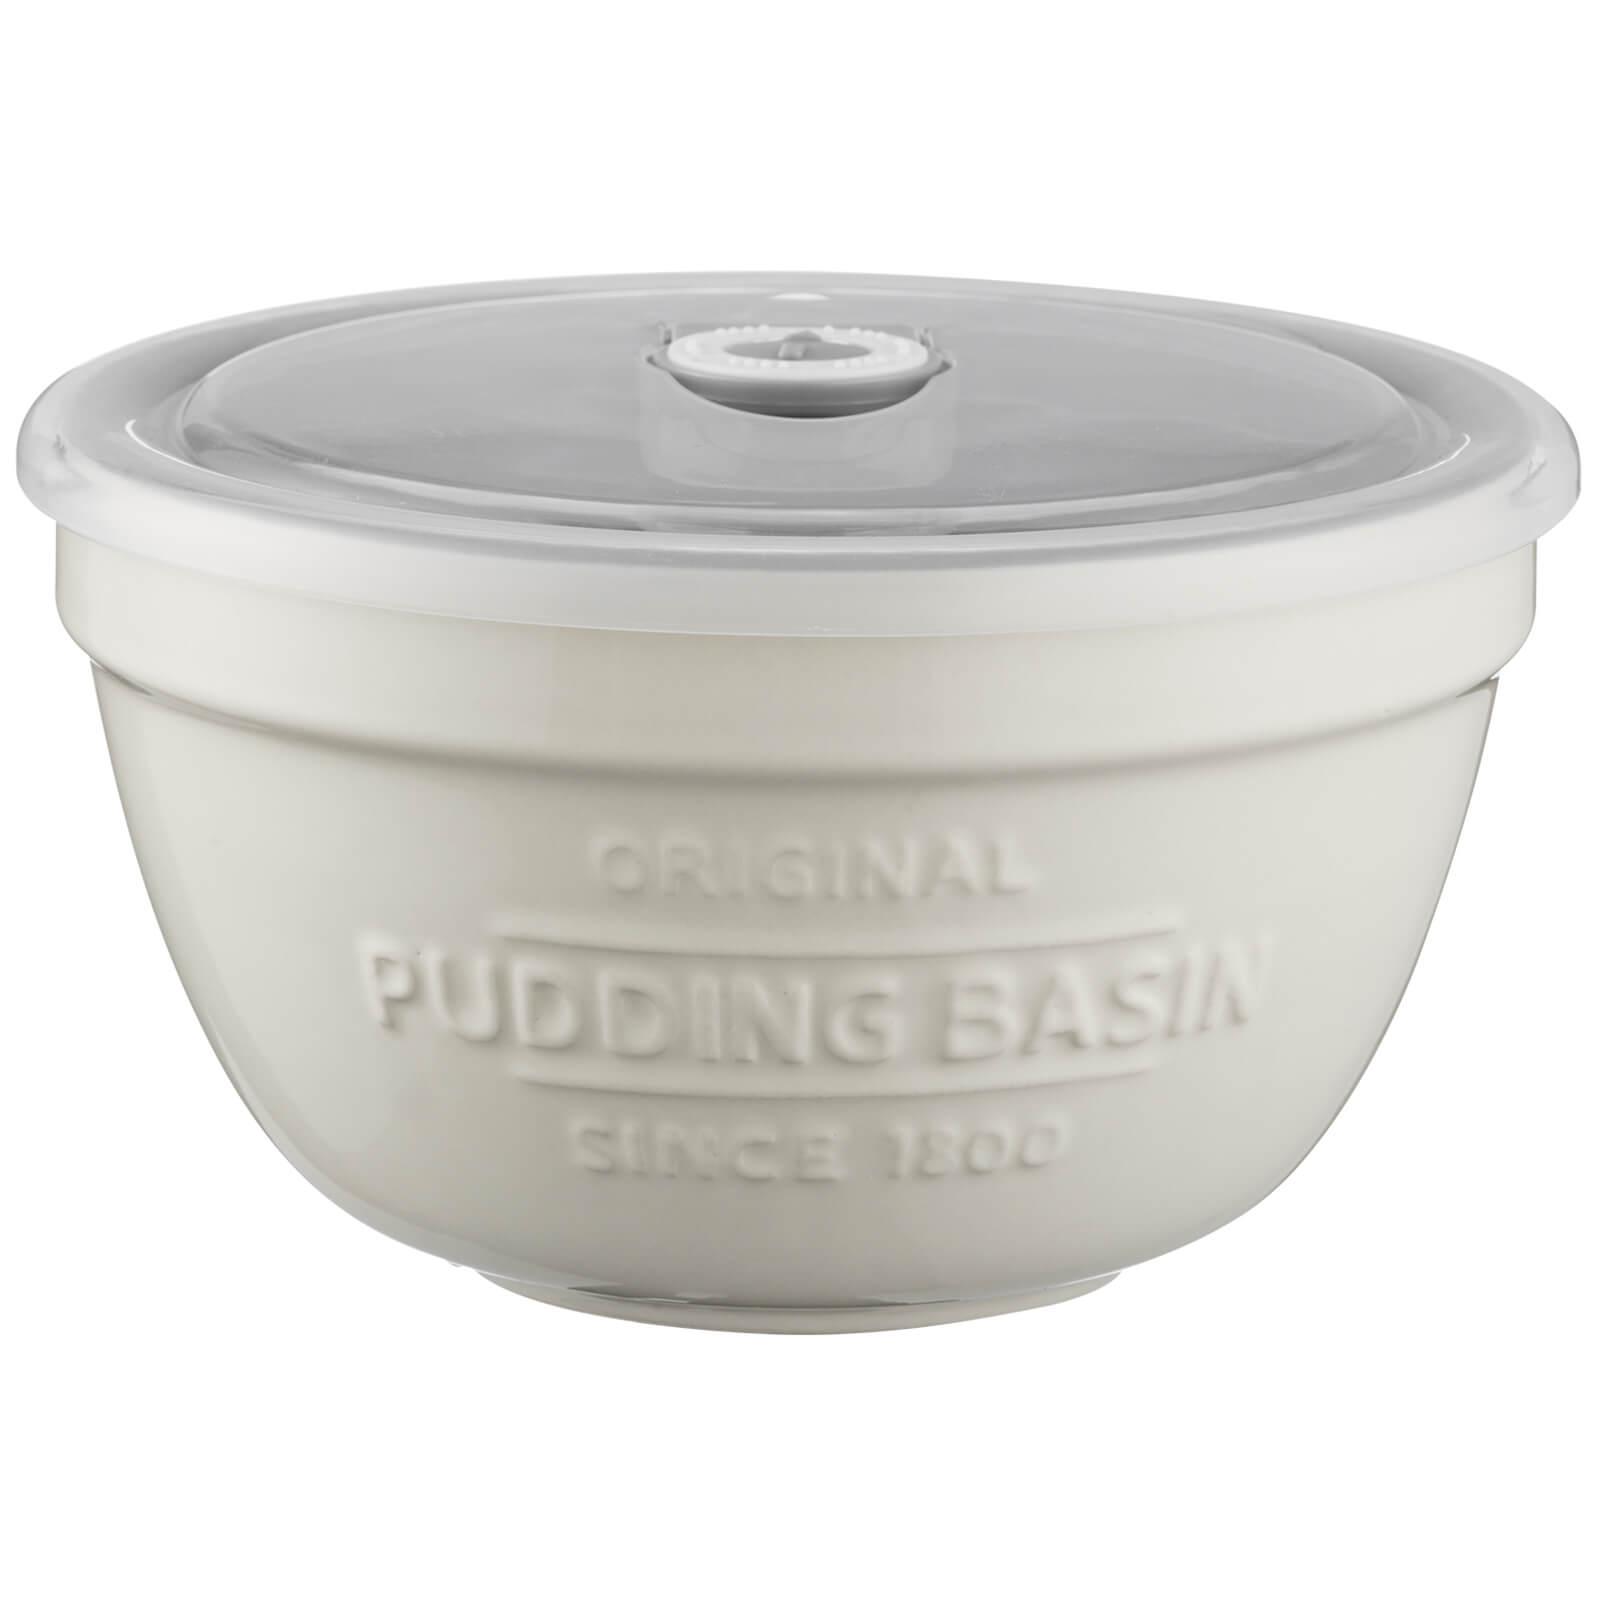 Mason Cash Innovative Kitchen Pudding Basin with Lid